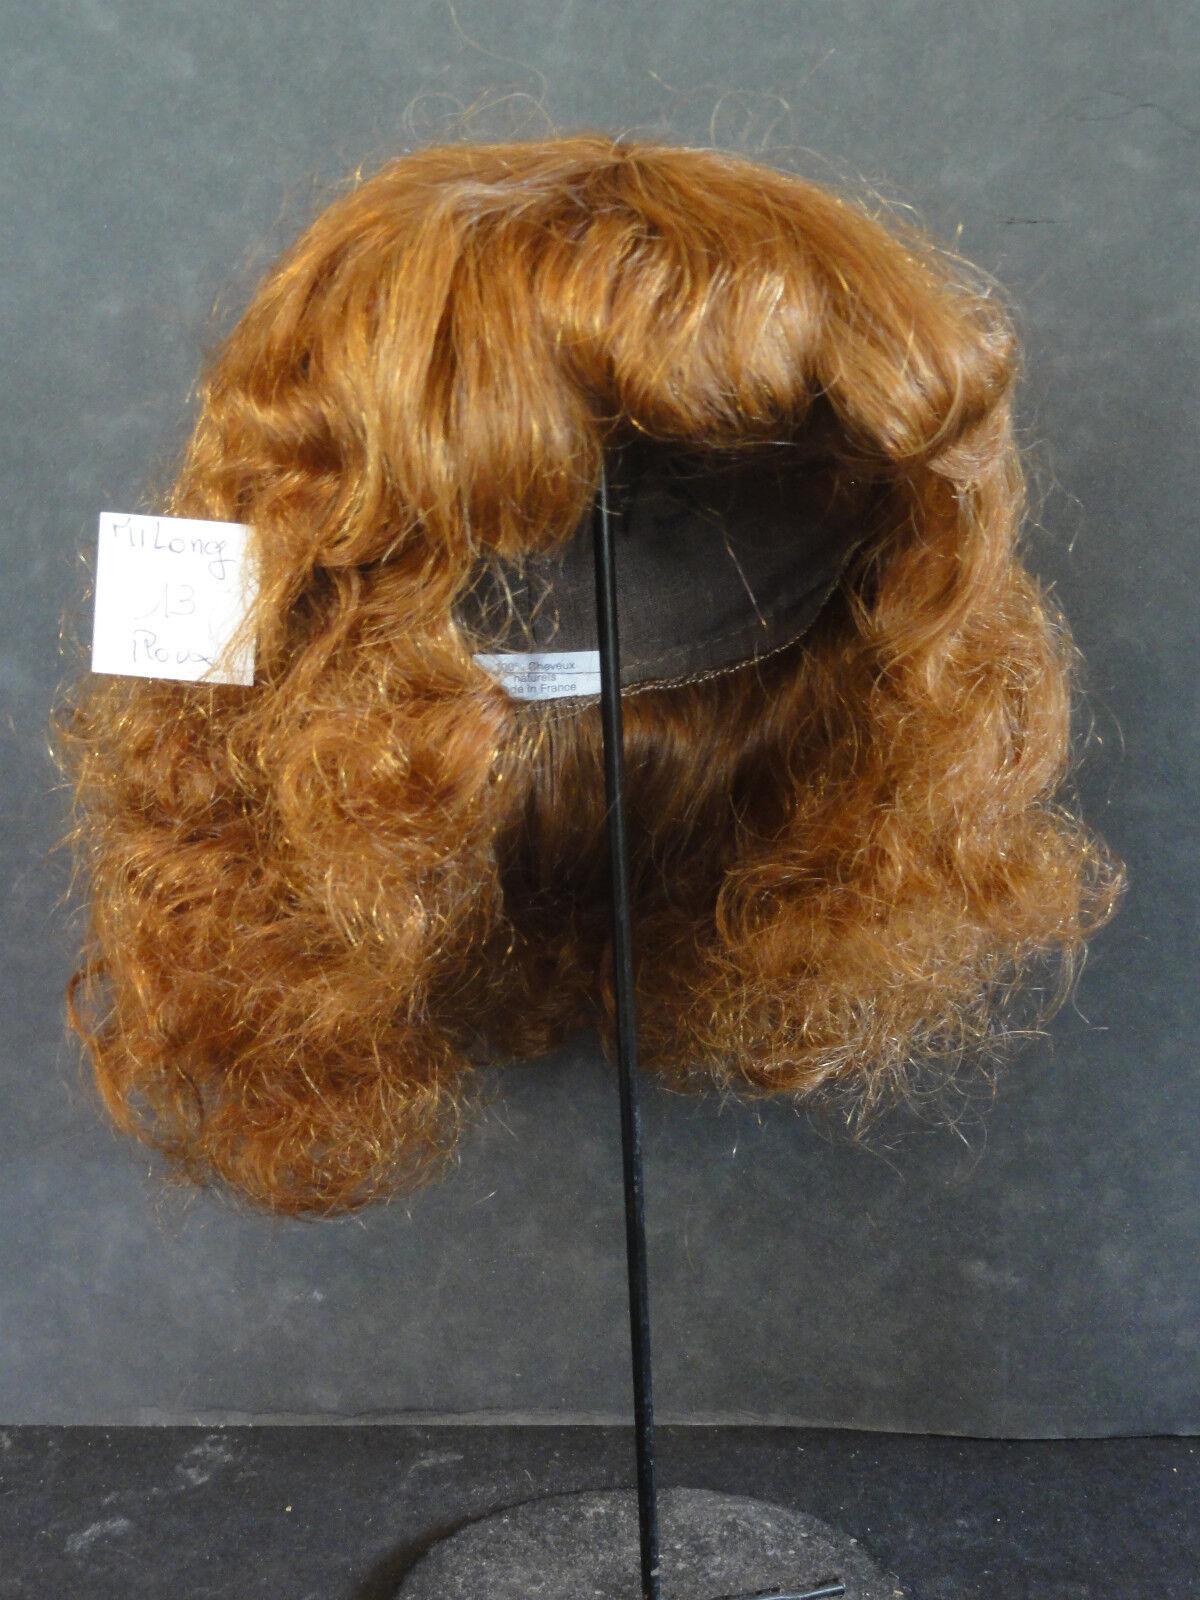 40% Promo Perücke Puppe T13 (40.5cm) (40.5cm) (40.5cm) 100% Haare Halb Lang Puppe Perücke 366183